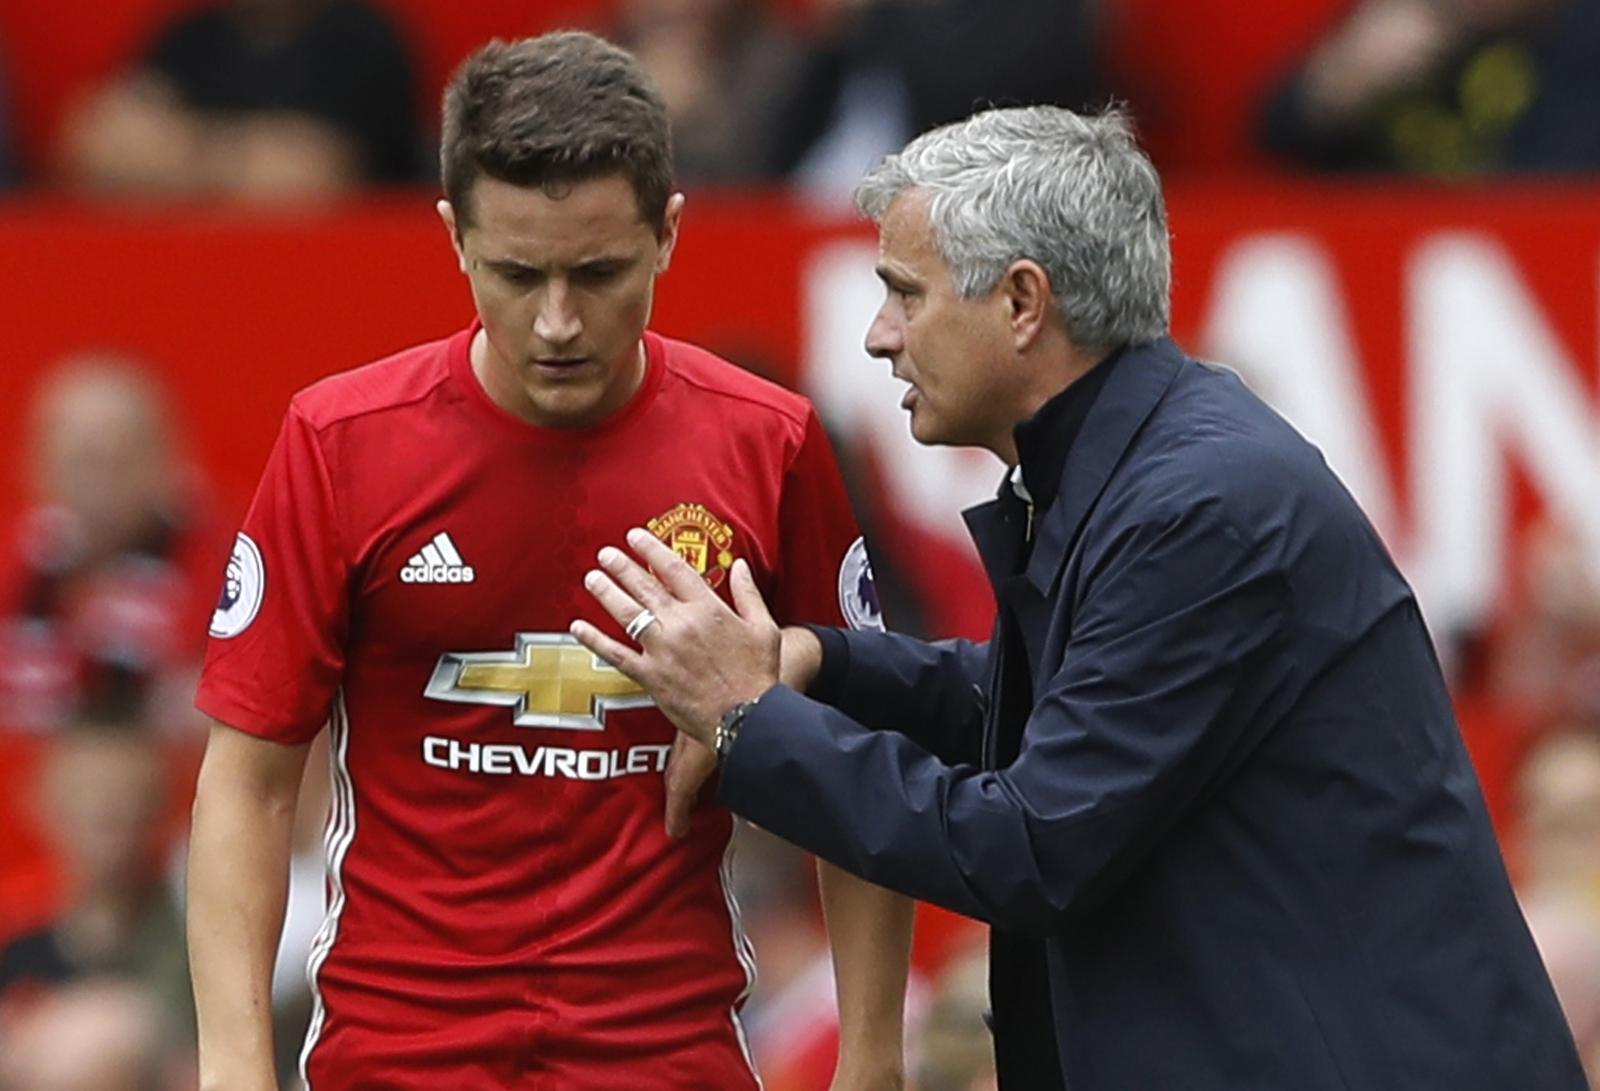 Ander Herrera and Jose Mourinho